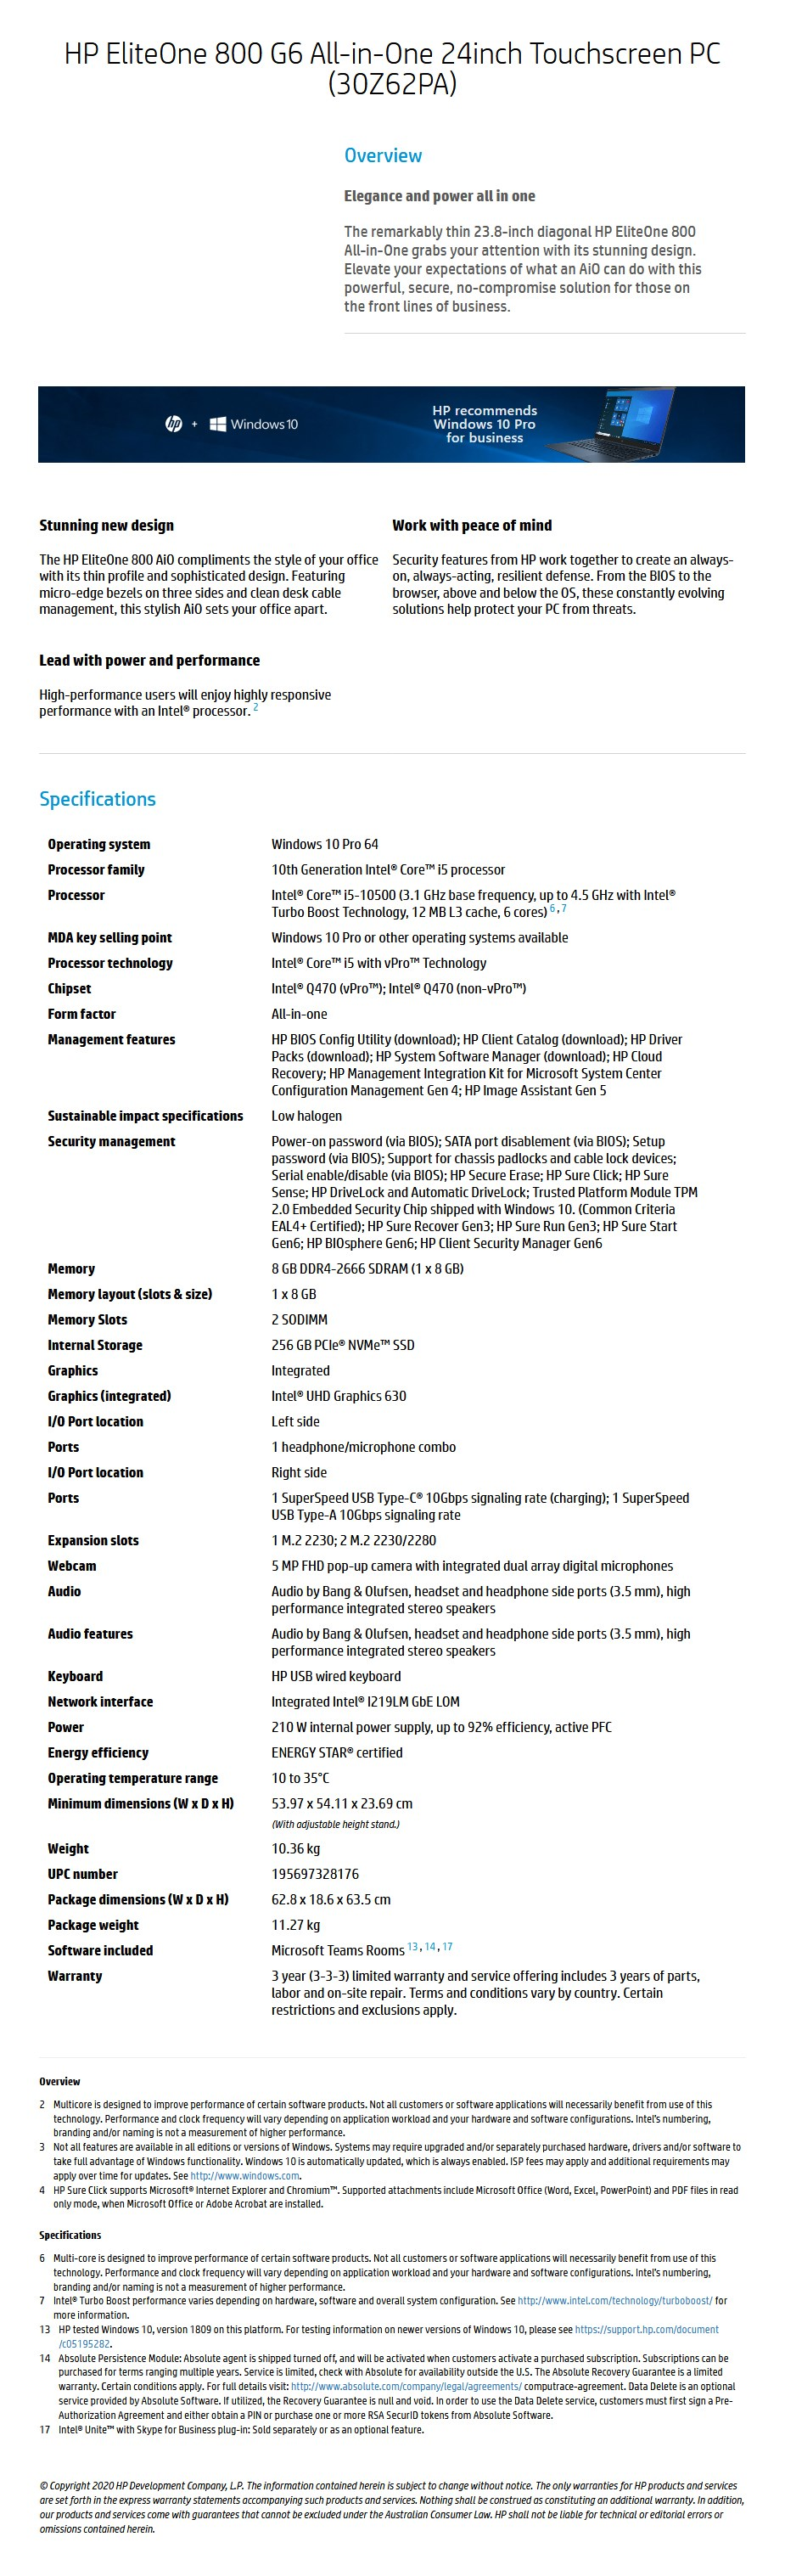 hp-eliteone-800-g6-aio-touch-pc-fhd-238-i510500-8gb-256gb-wifi-bt-w10p-ac41144-4.jpg